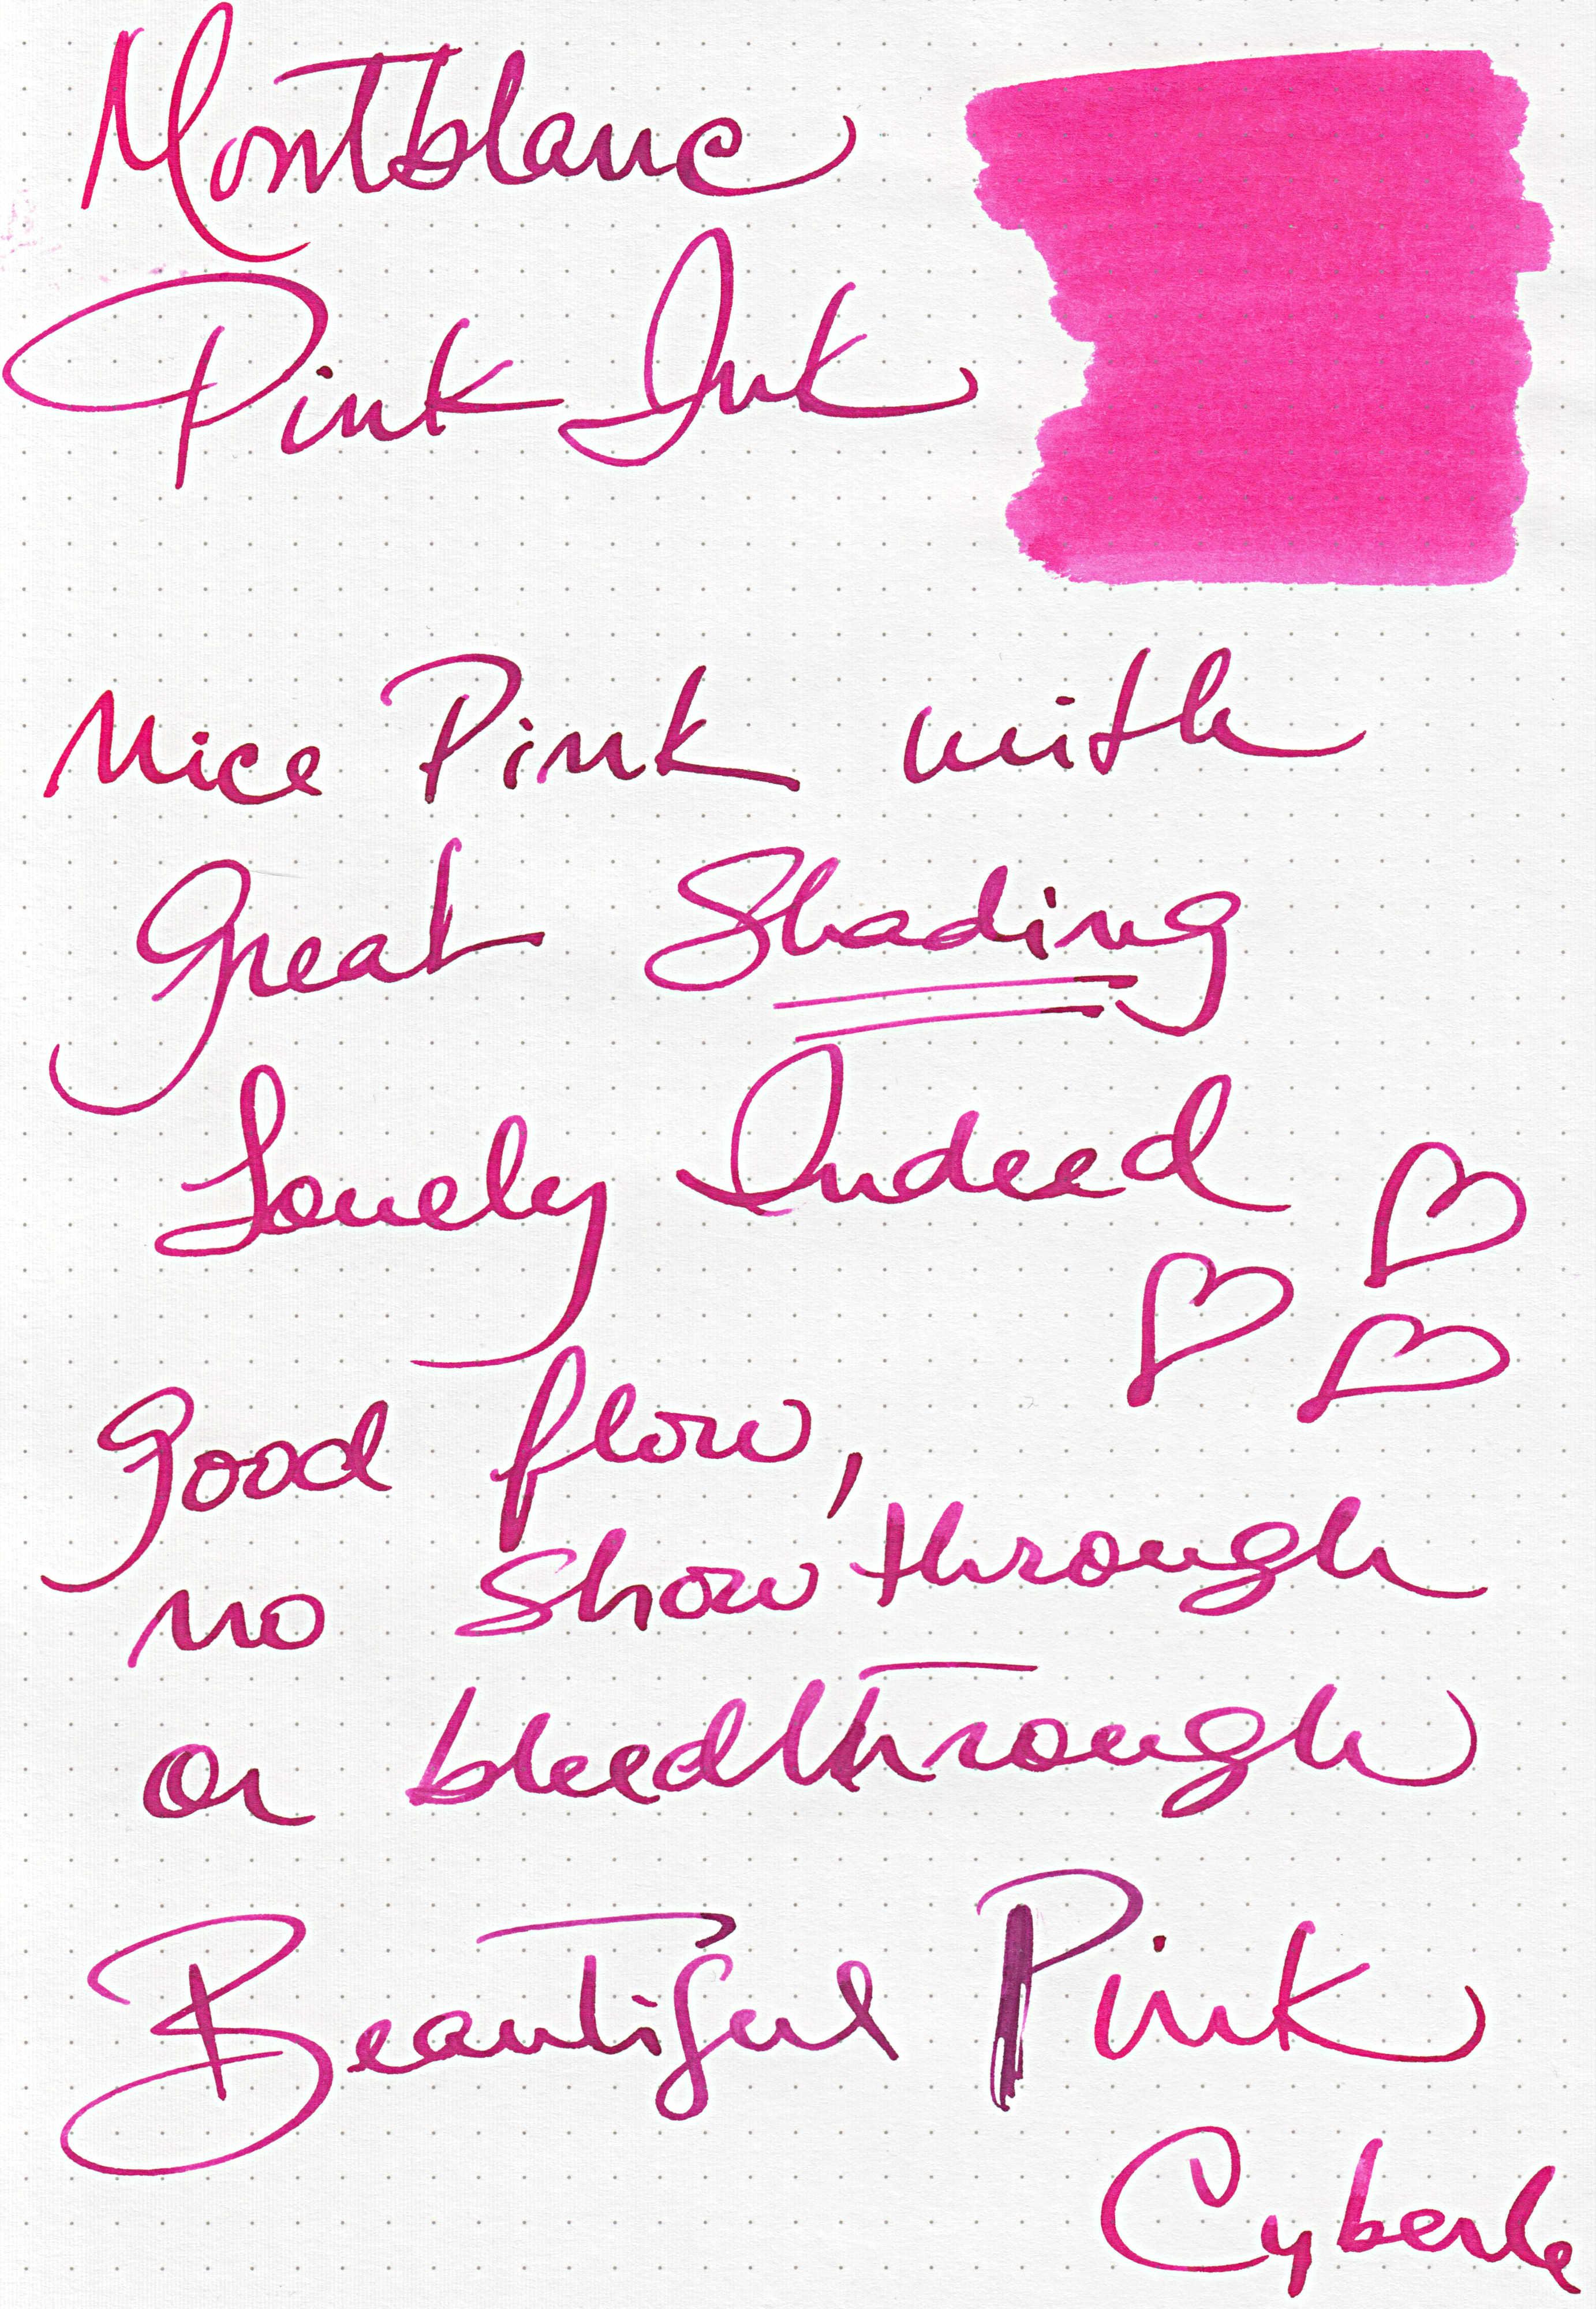 fpn_1426306924__montblanc_pink02.jpg